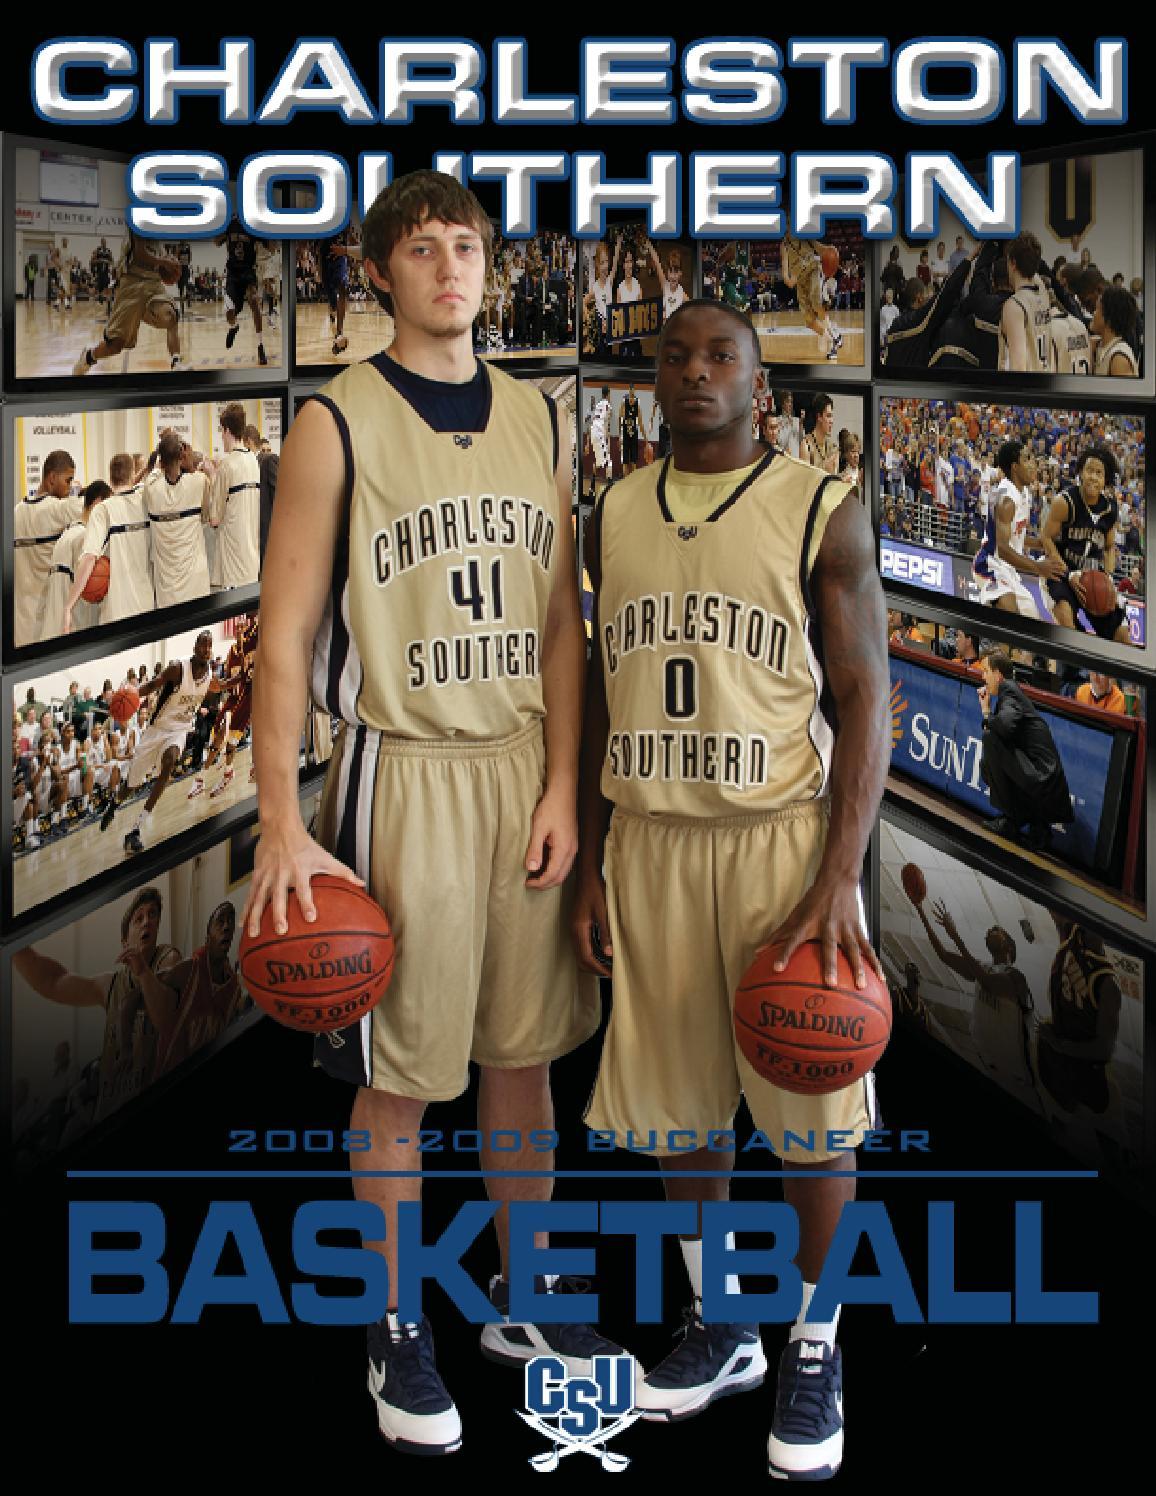 80e947973e8f 2008-09 Men s Basketball Media Guide by CSUSports - issuu